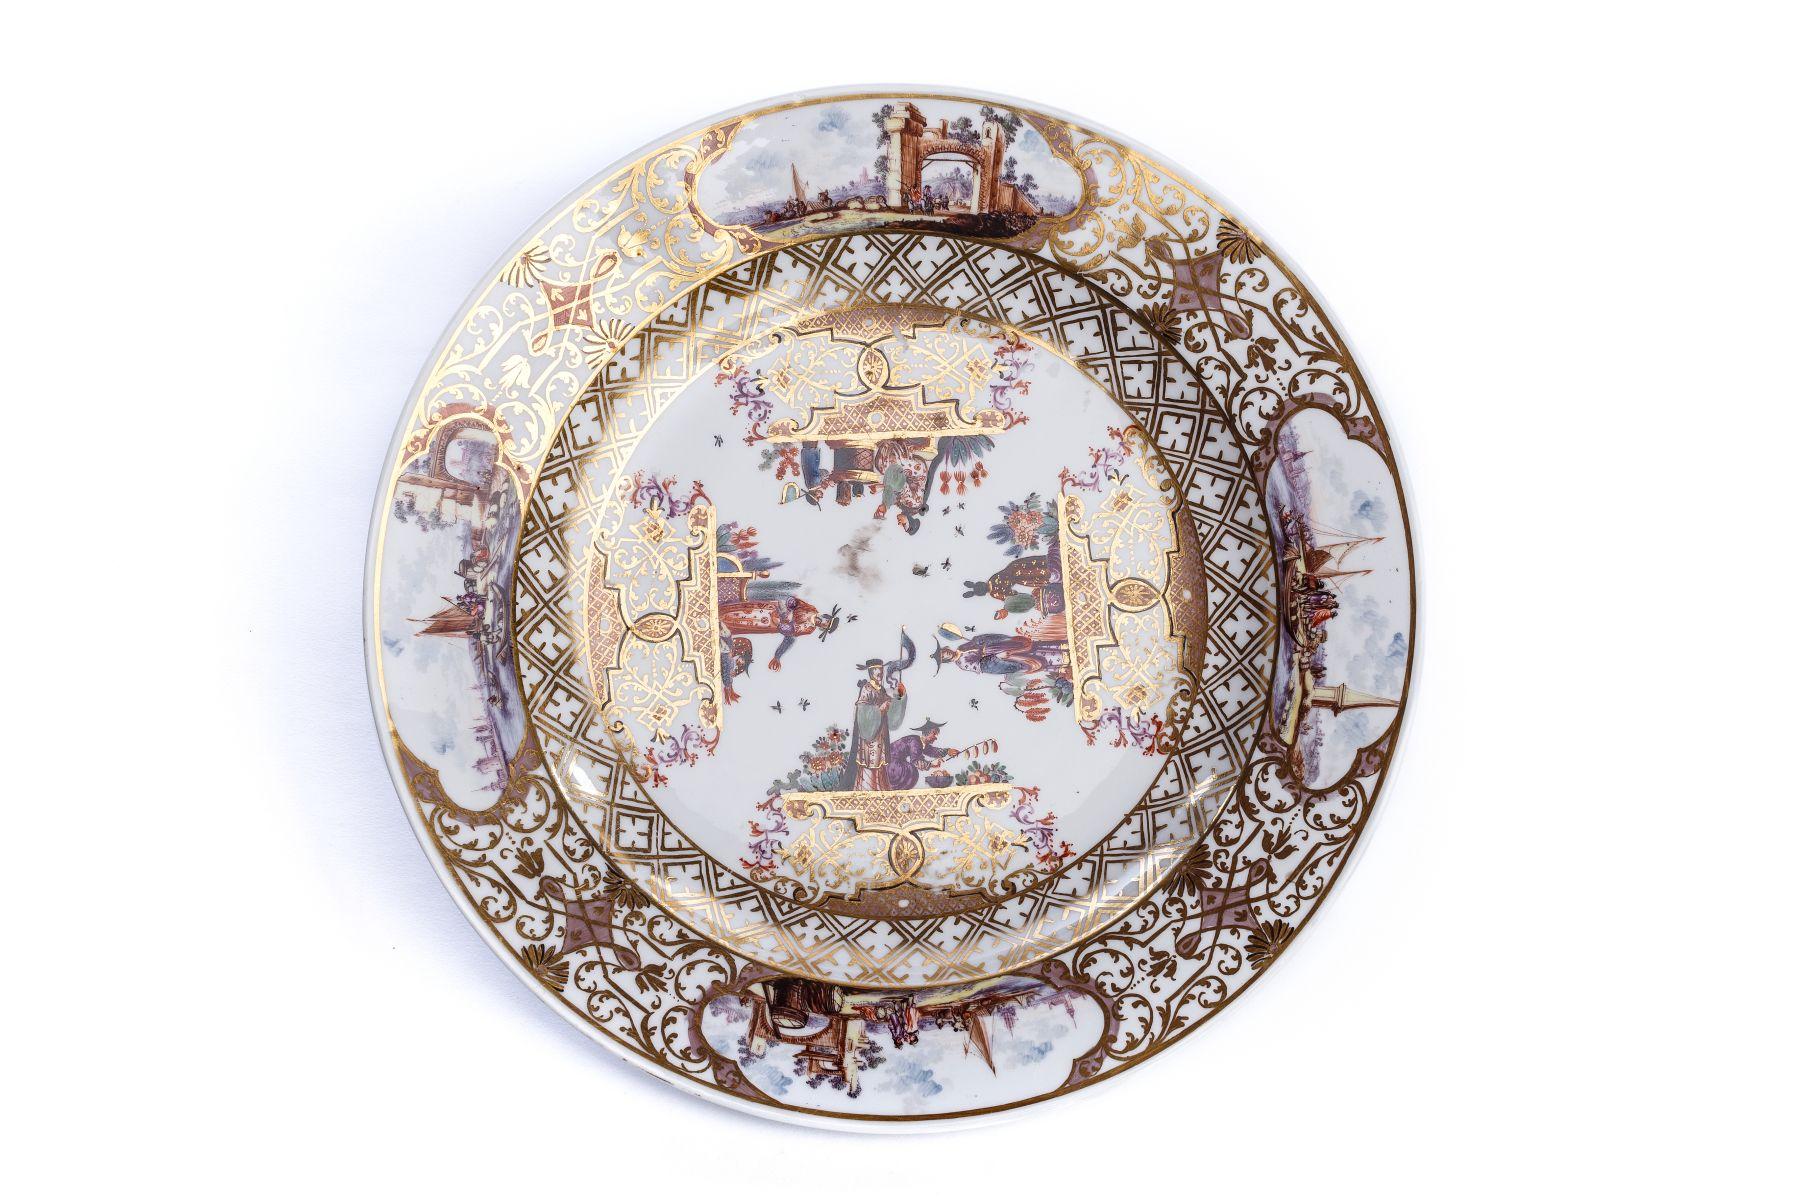 #54 Splendor plate, Meissen 1730/35 | Prunkplatte, Meissen 1730/35 Image